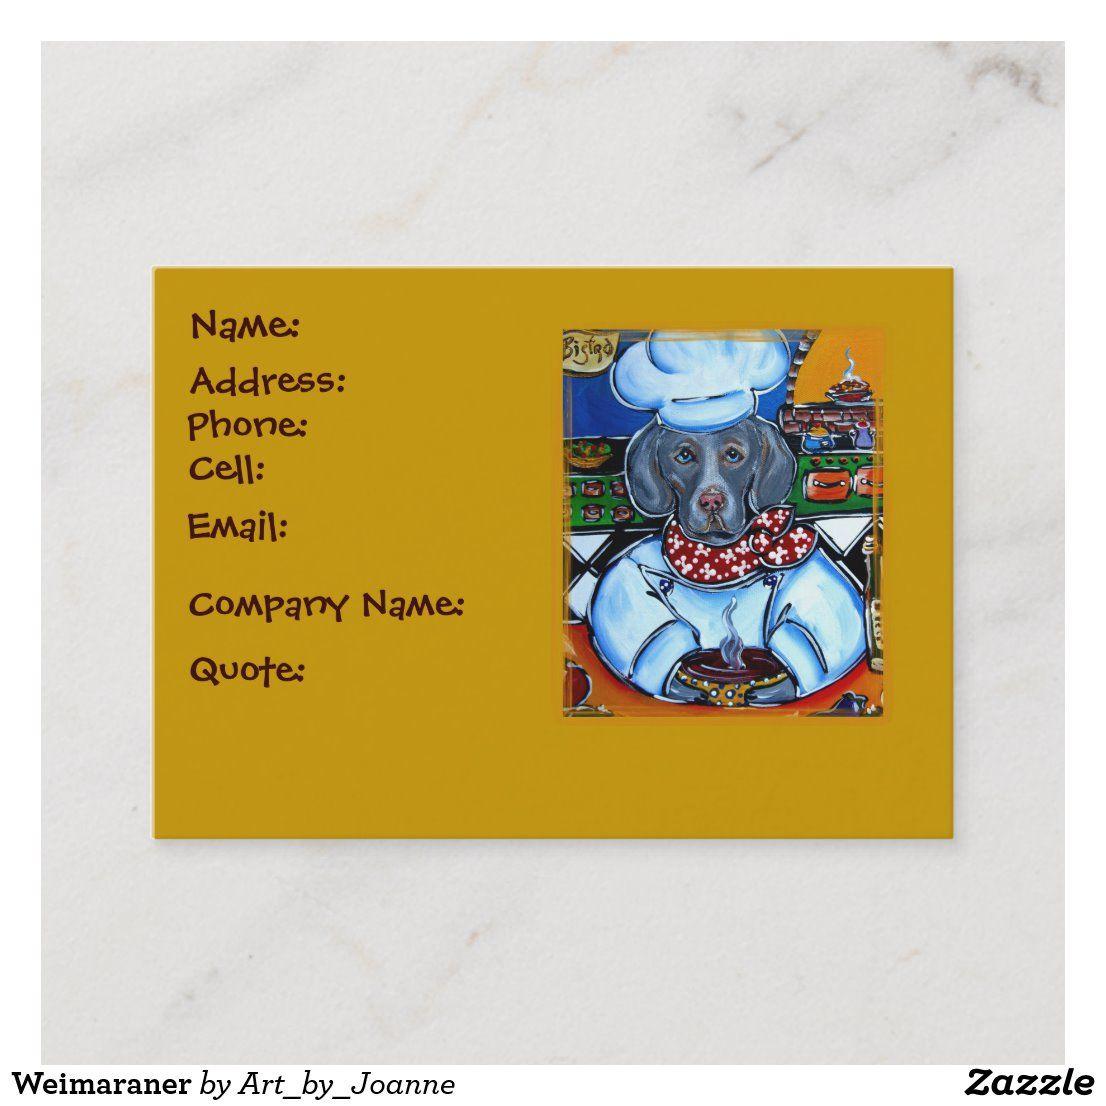 Weimaraner Business Card Weimaraner, Dog